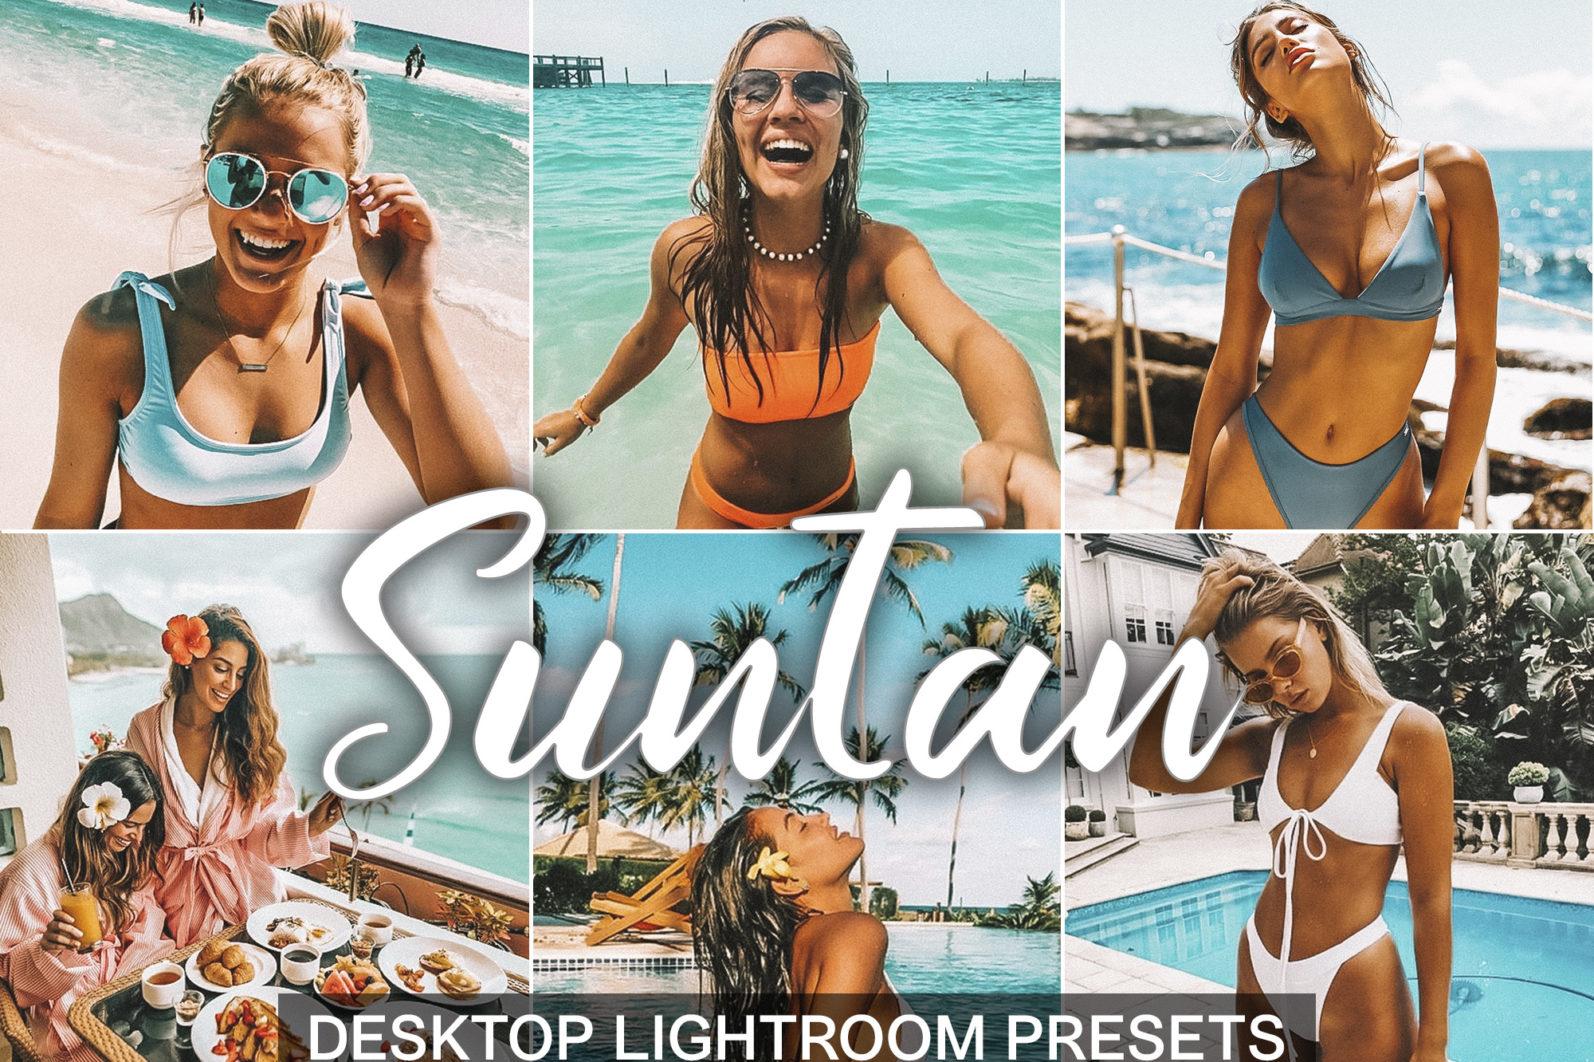 10 Mobile & Desktop Presets SUNTAN - desktop lightroom presets cover product 21 5 Suntan -